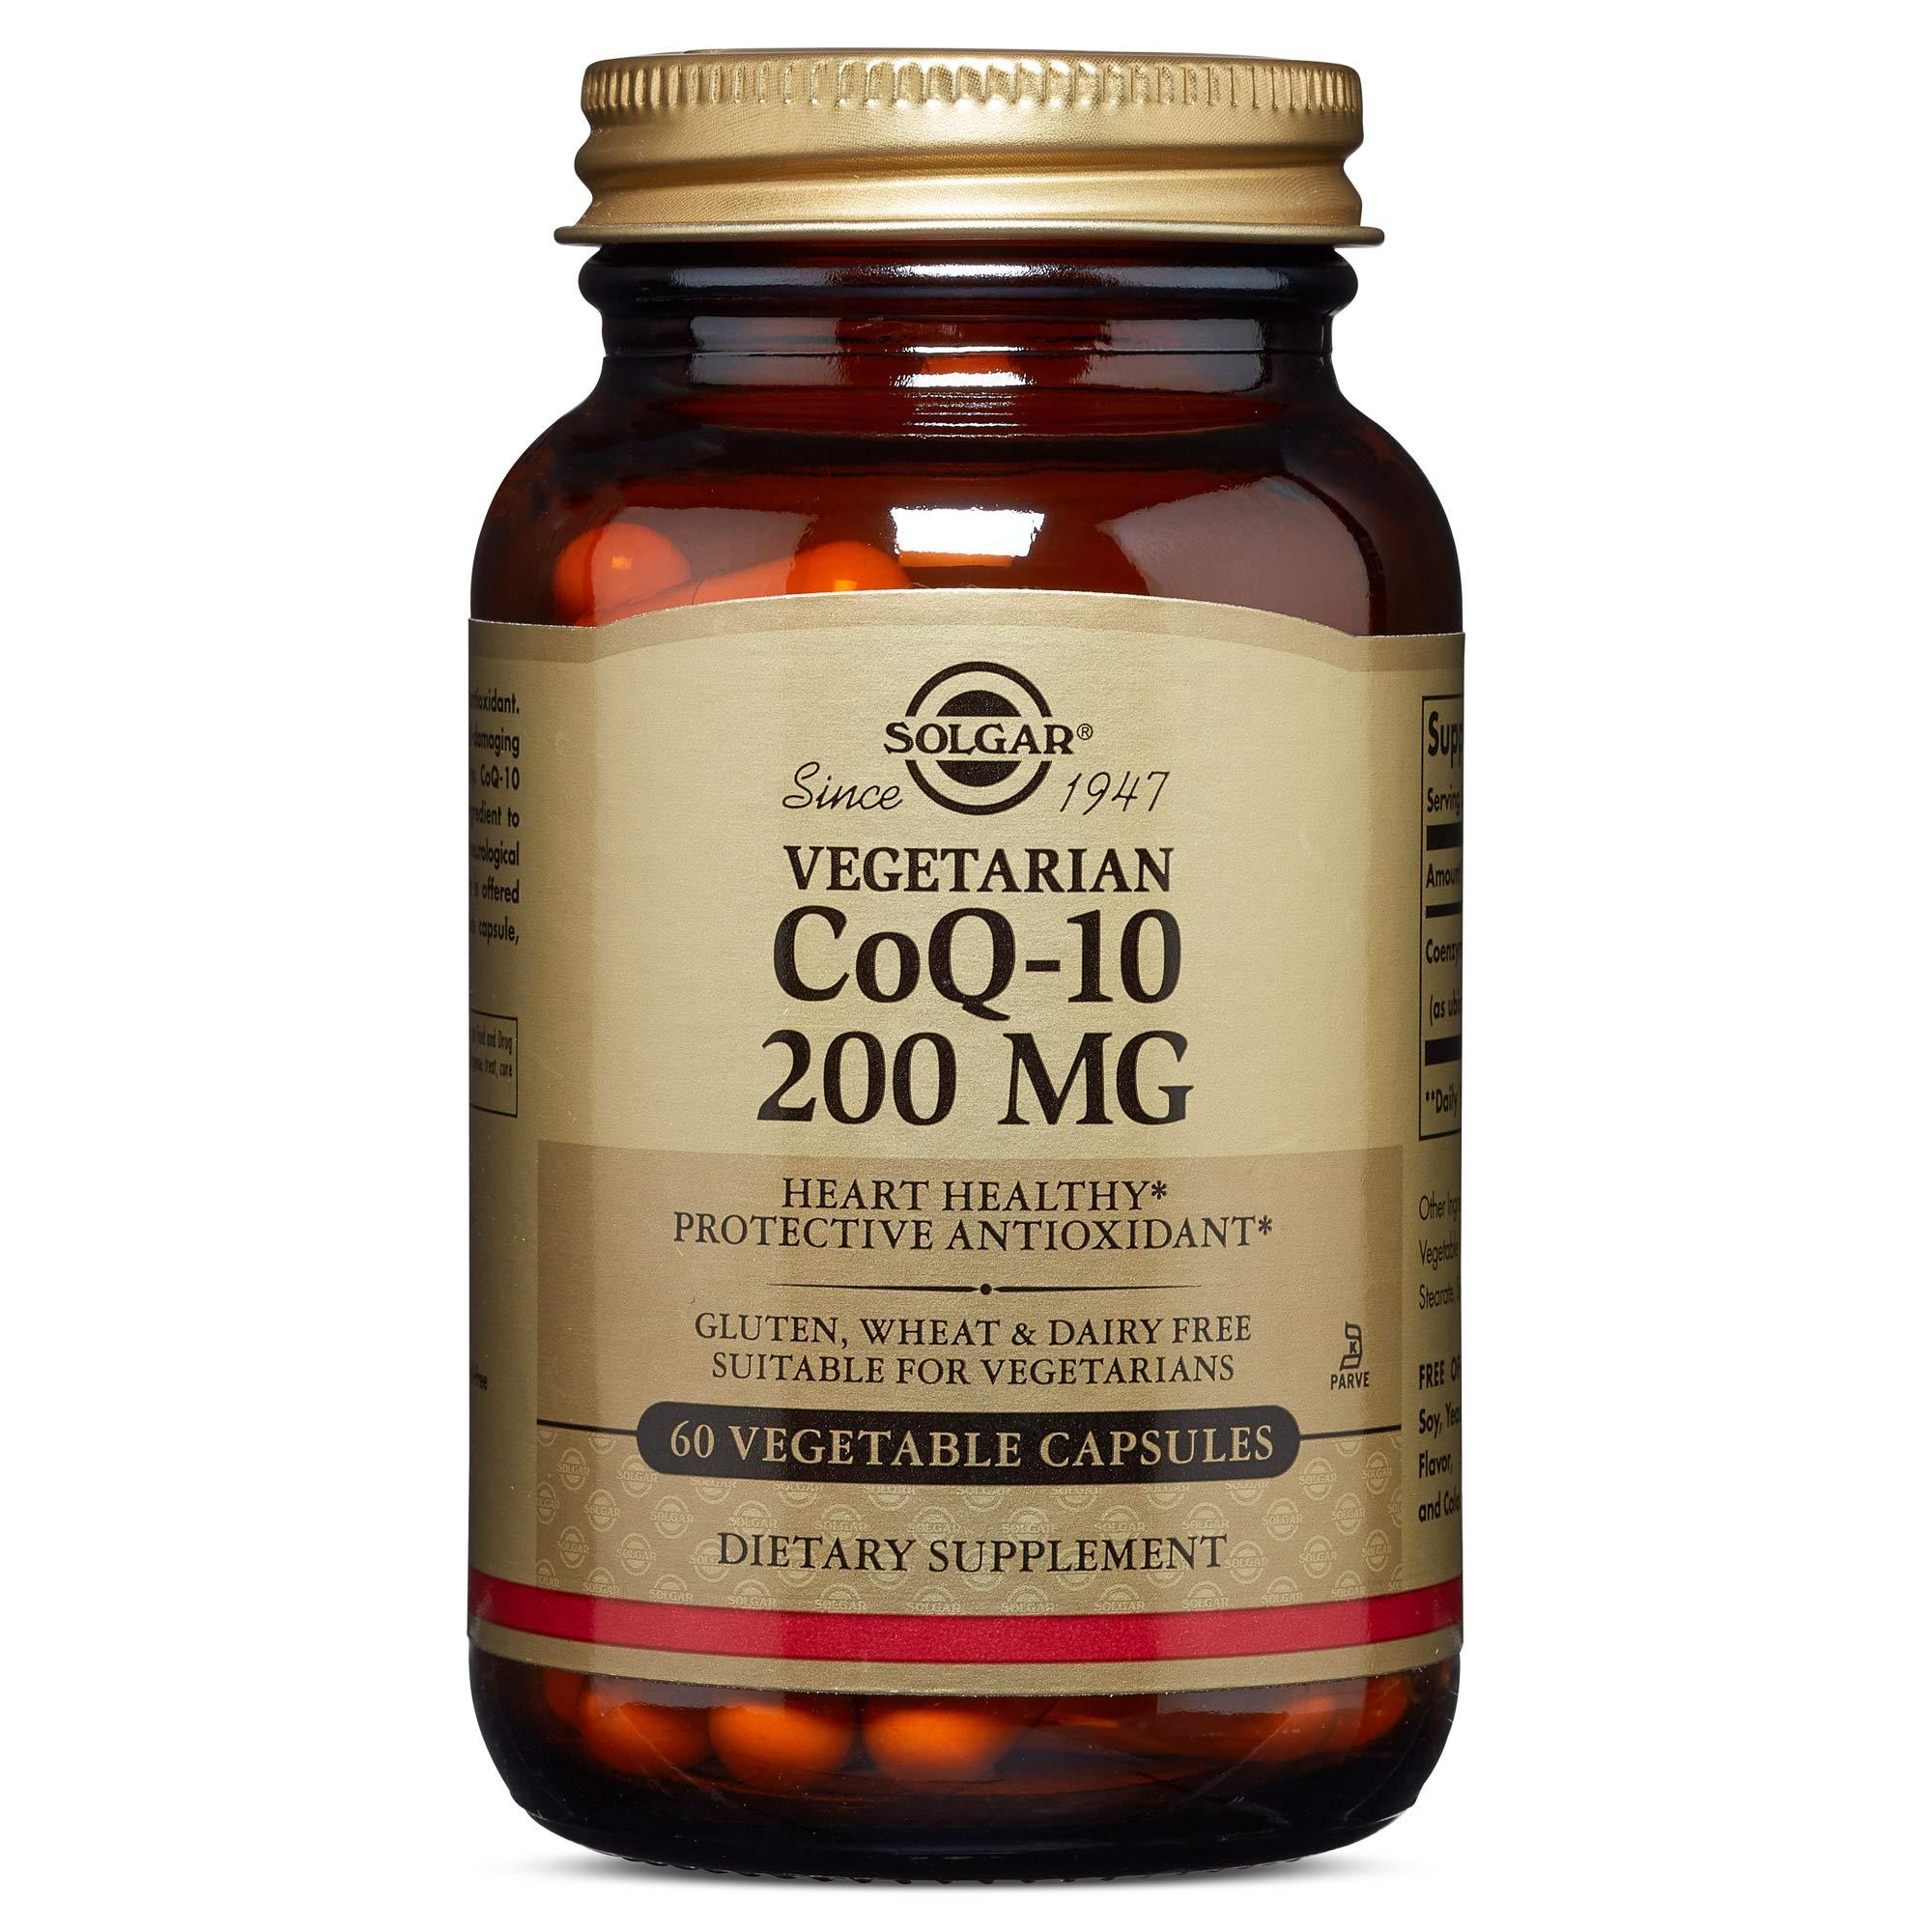 Solgar - Vegetarian CoQ-10 200mg, 60 Vegetable Capsules - Supports Healthy Aging by Solgar